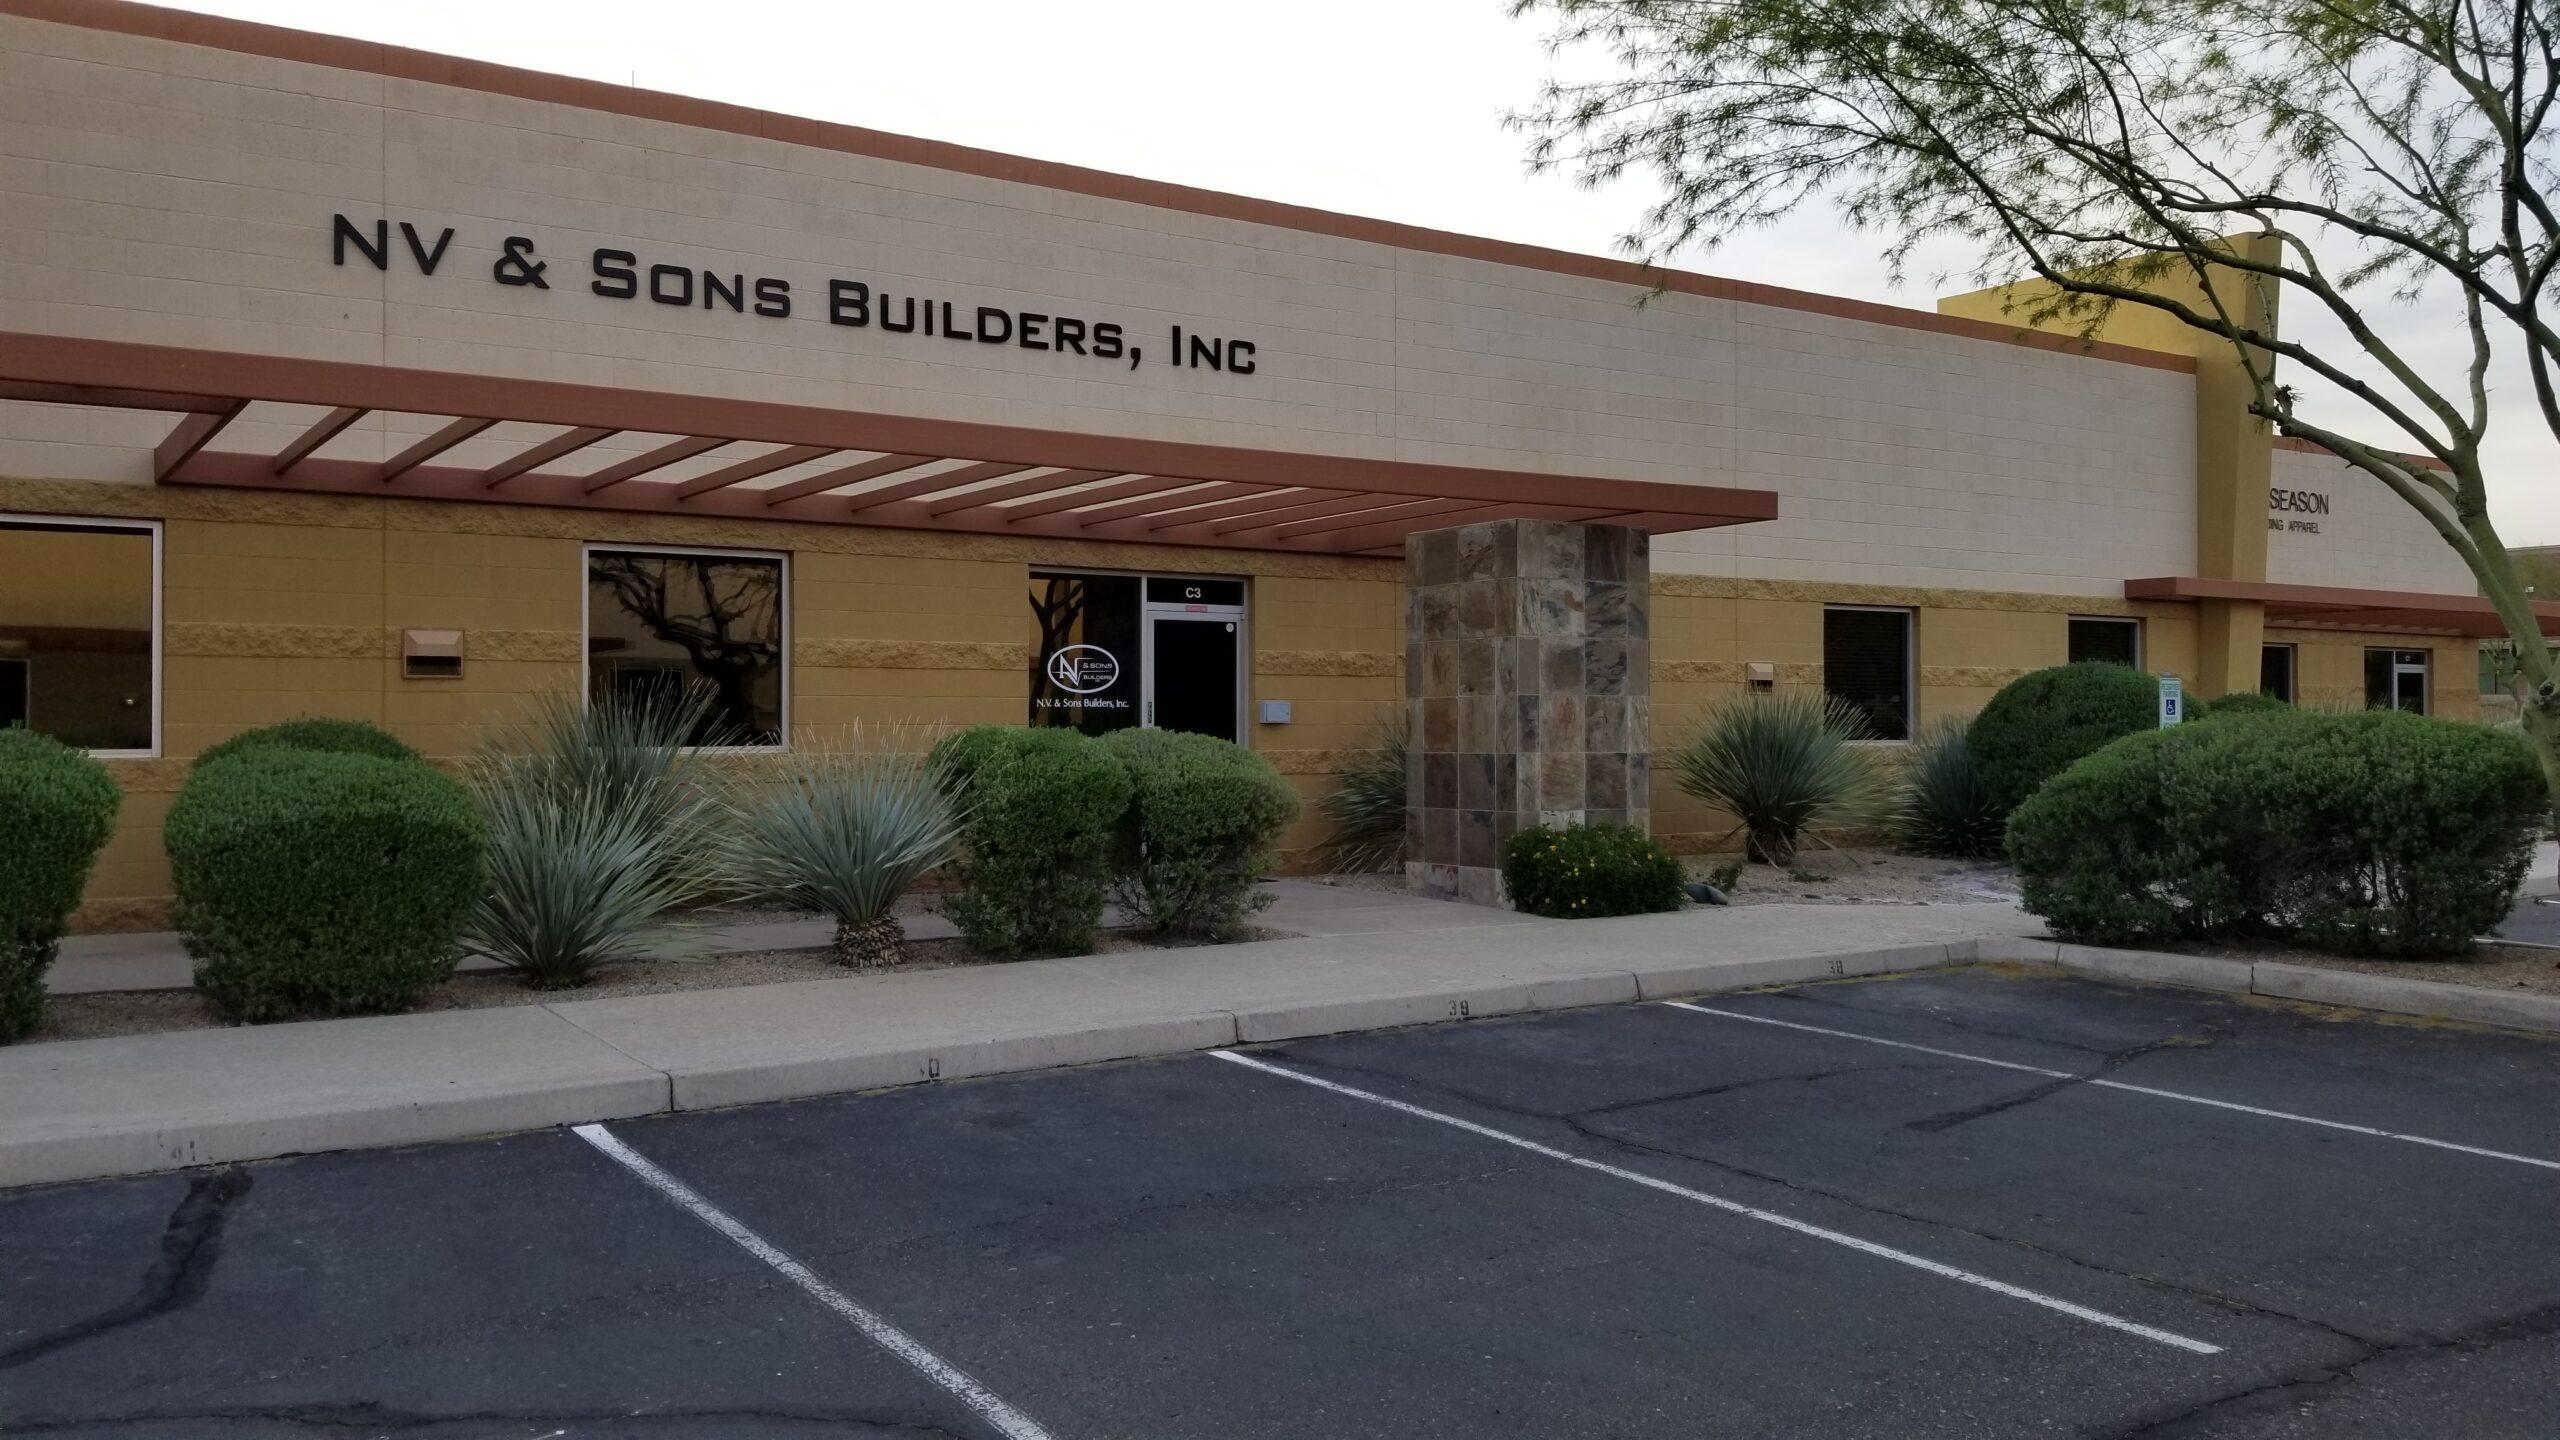 1420 N Hayden Rd, Scottsdale AZ 85258 Industrial Condo